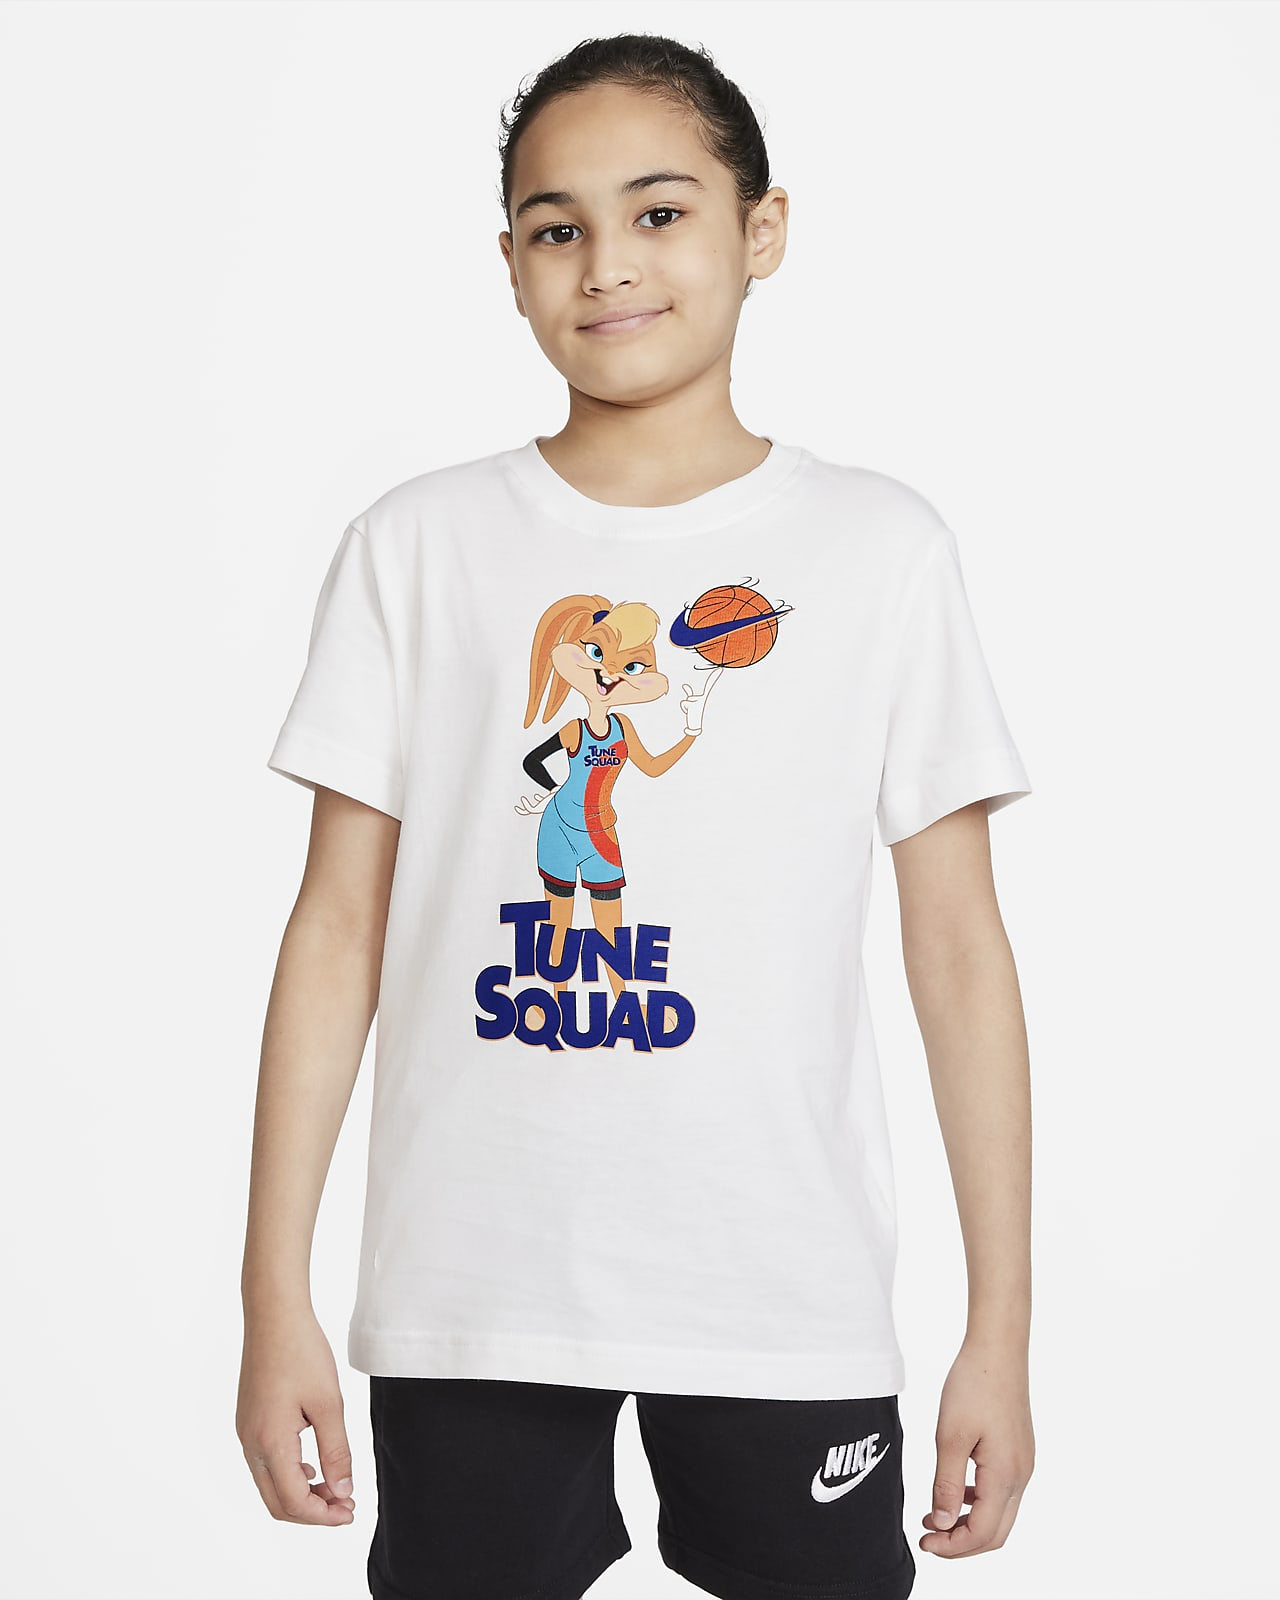 Nike Sportswear x Space Jam: A New Legacy Older Kids' (Girls') T-Shirt